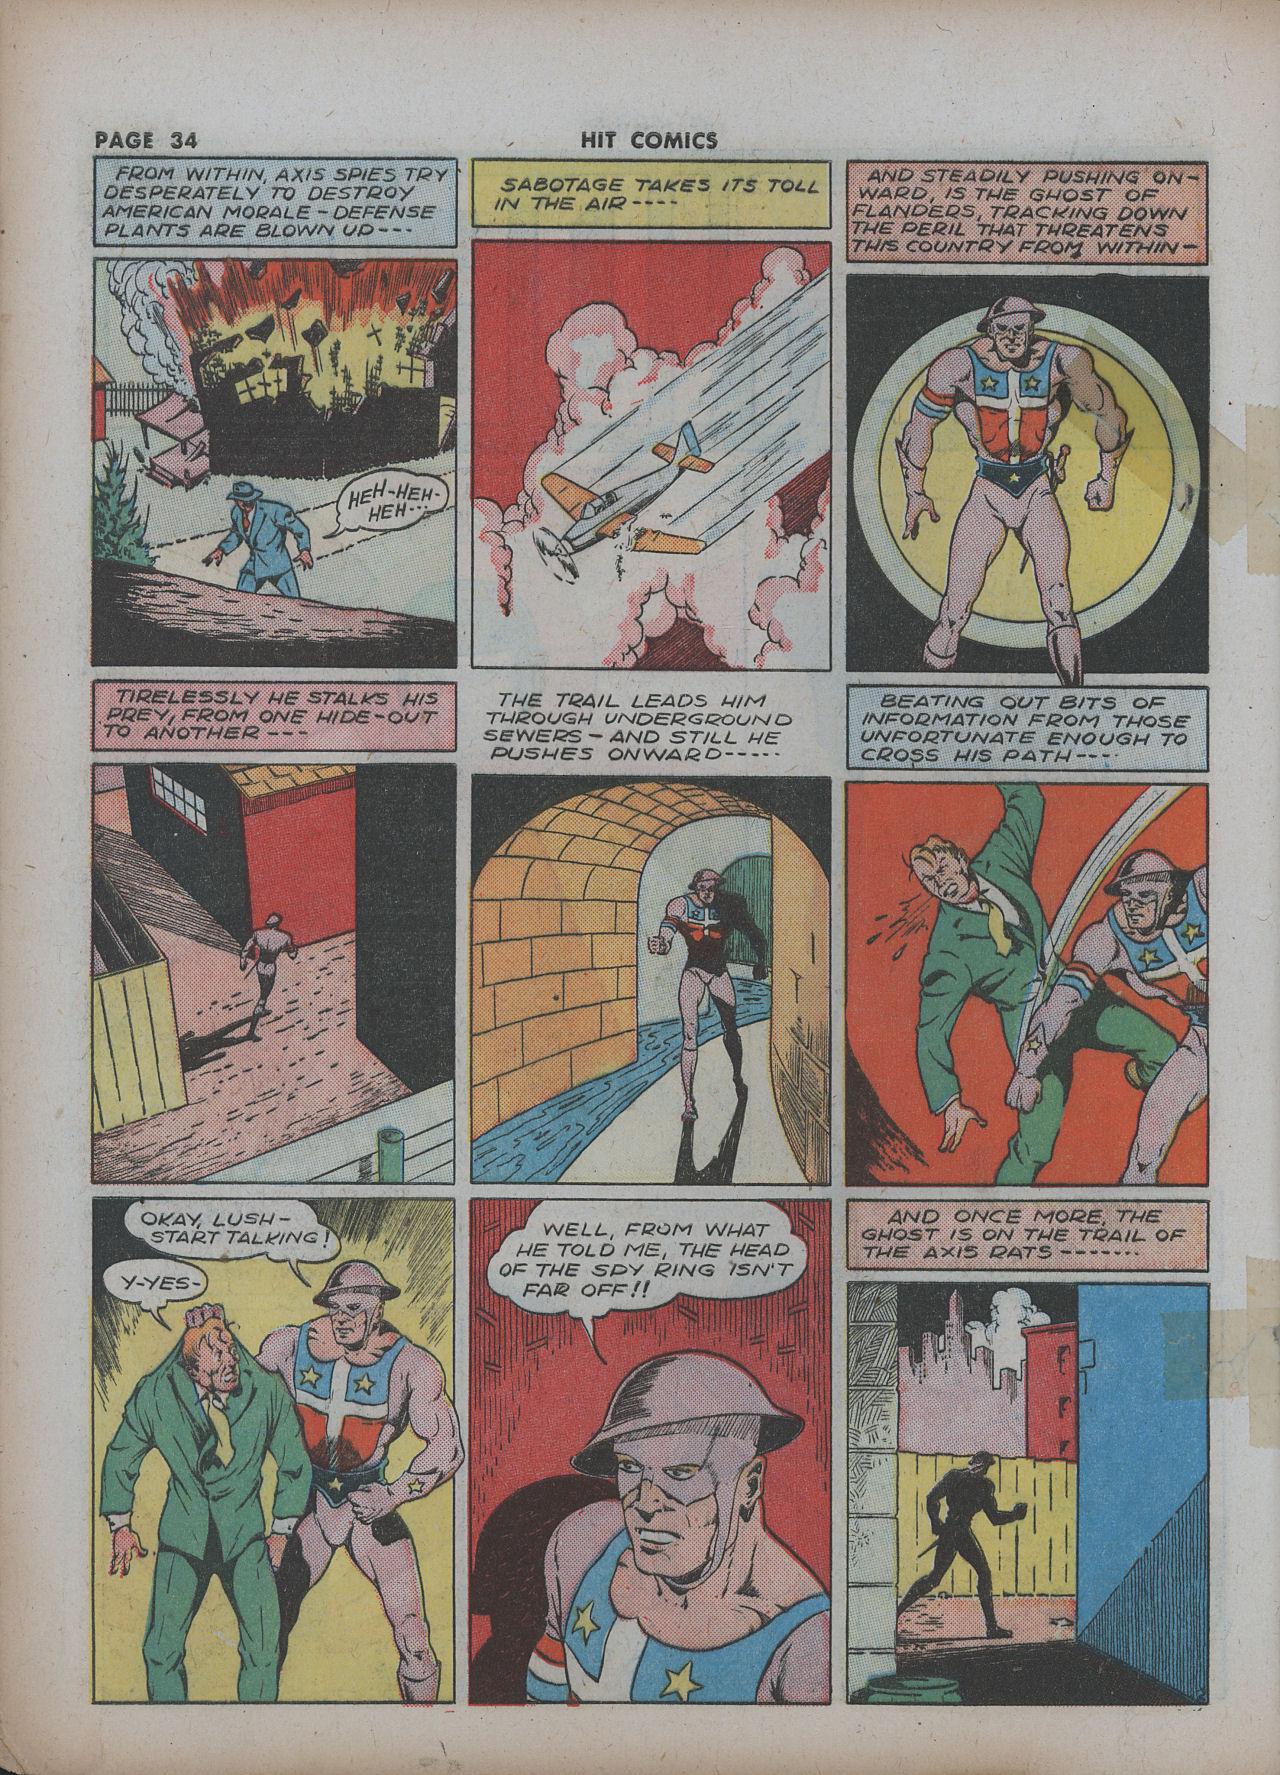 Read online Hit Comics comic -  Issue #22 - 36